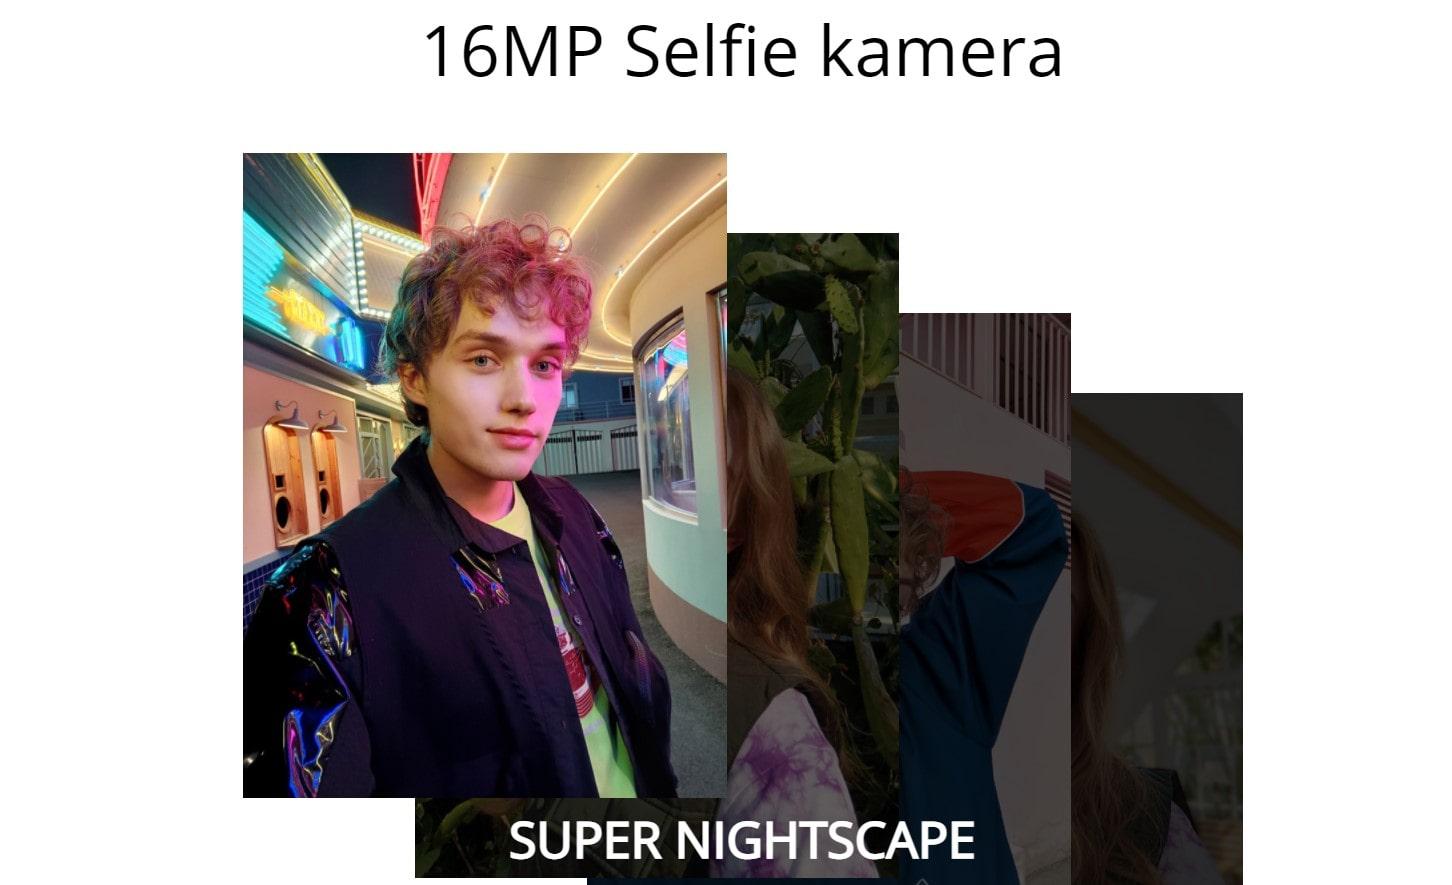 Realme 8 6GB/128GB selfie kamera